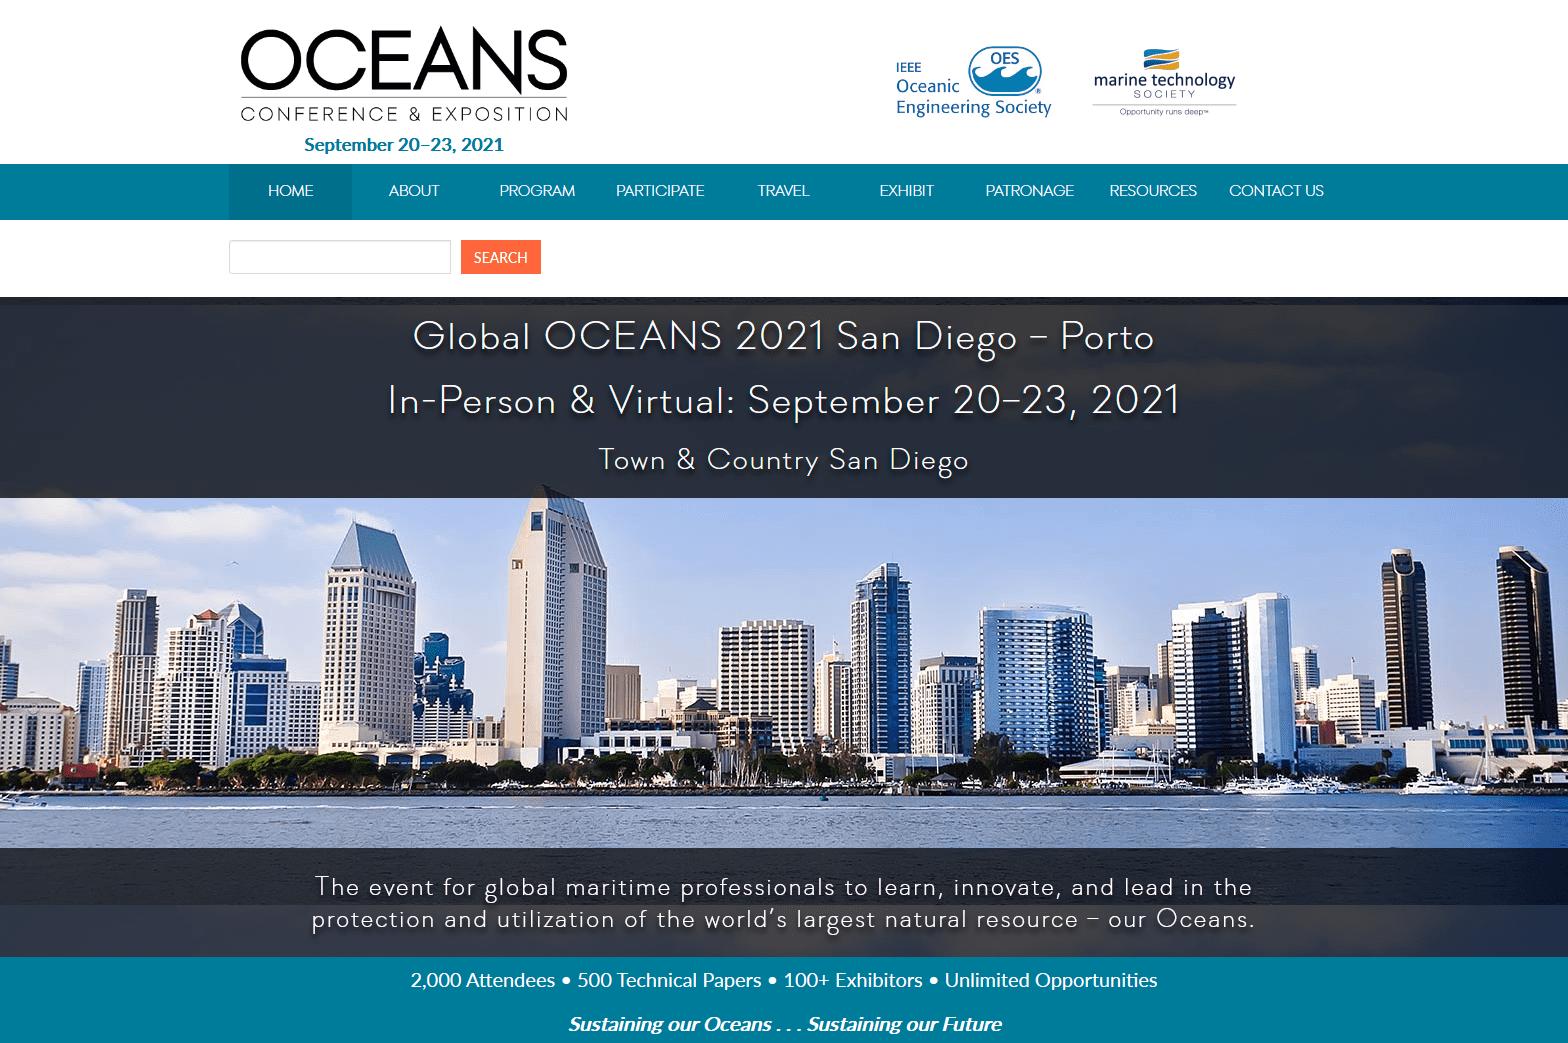 OCEANS 2021 San Diego